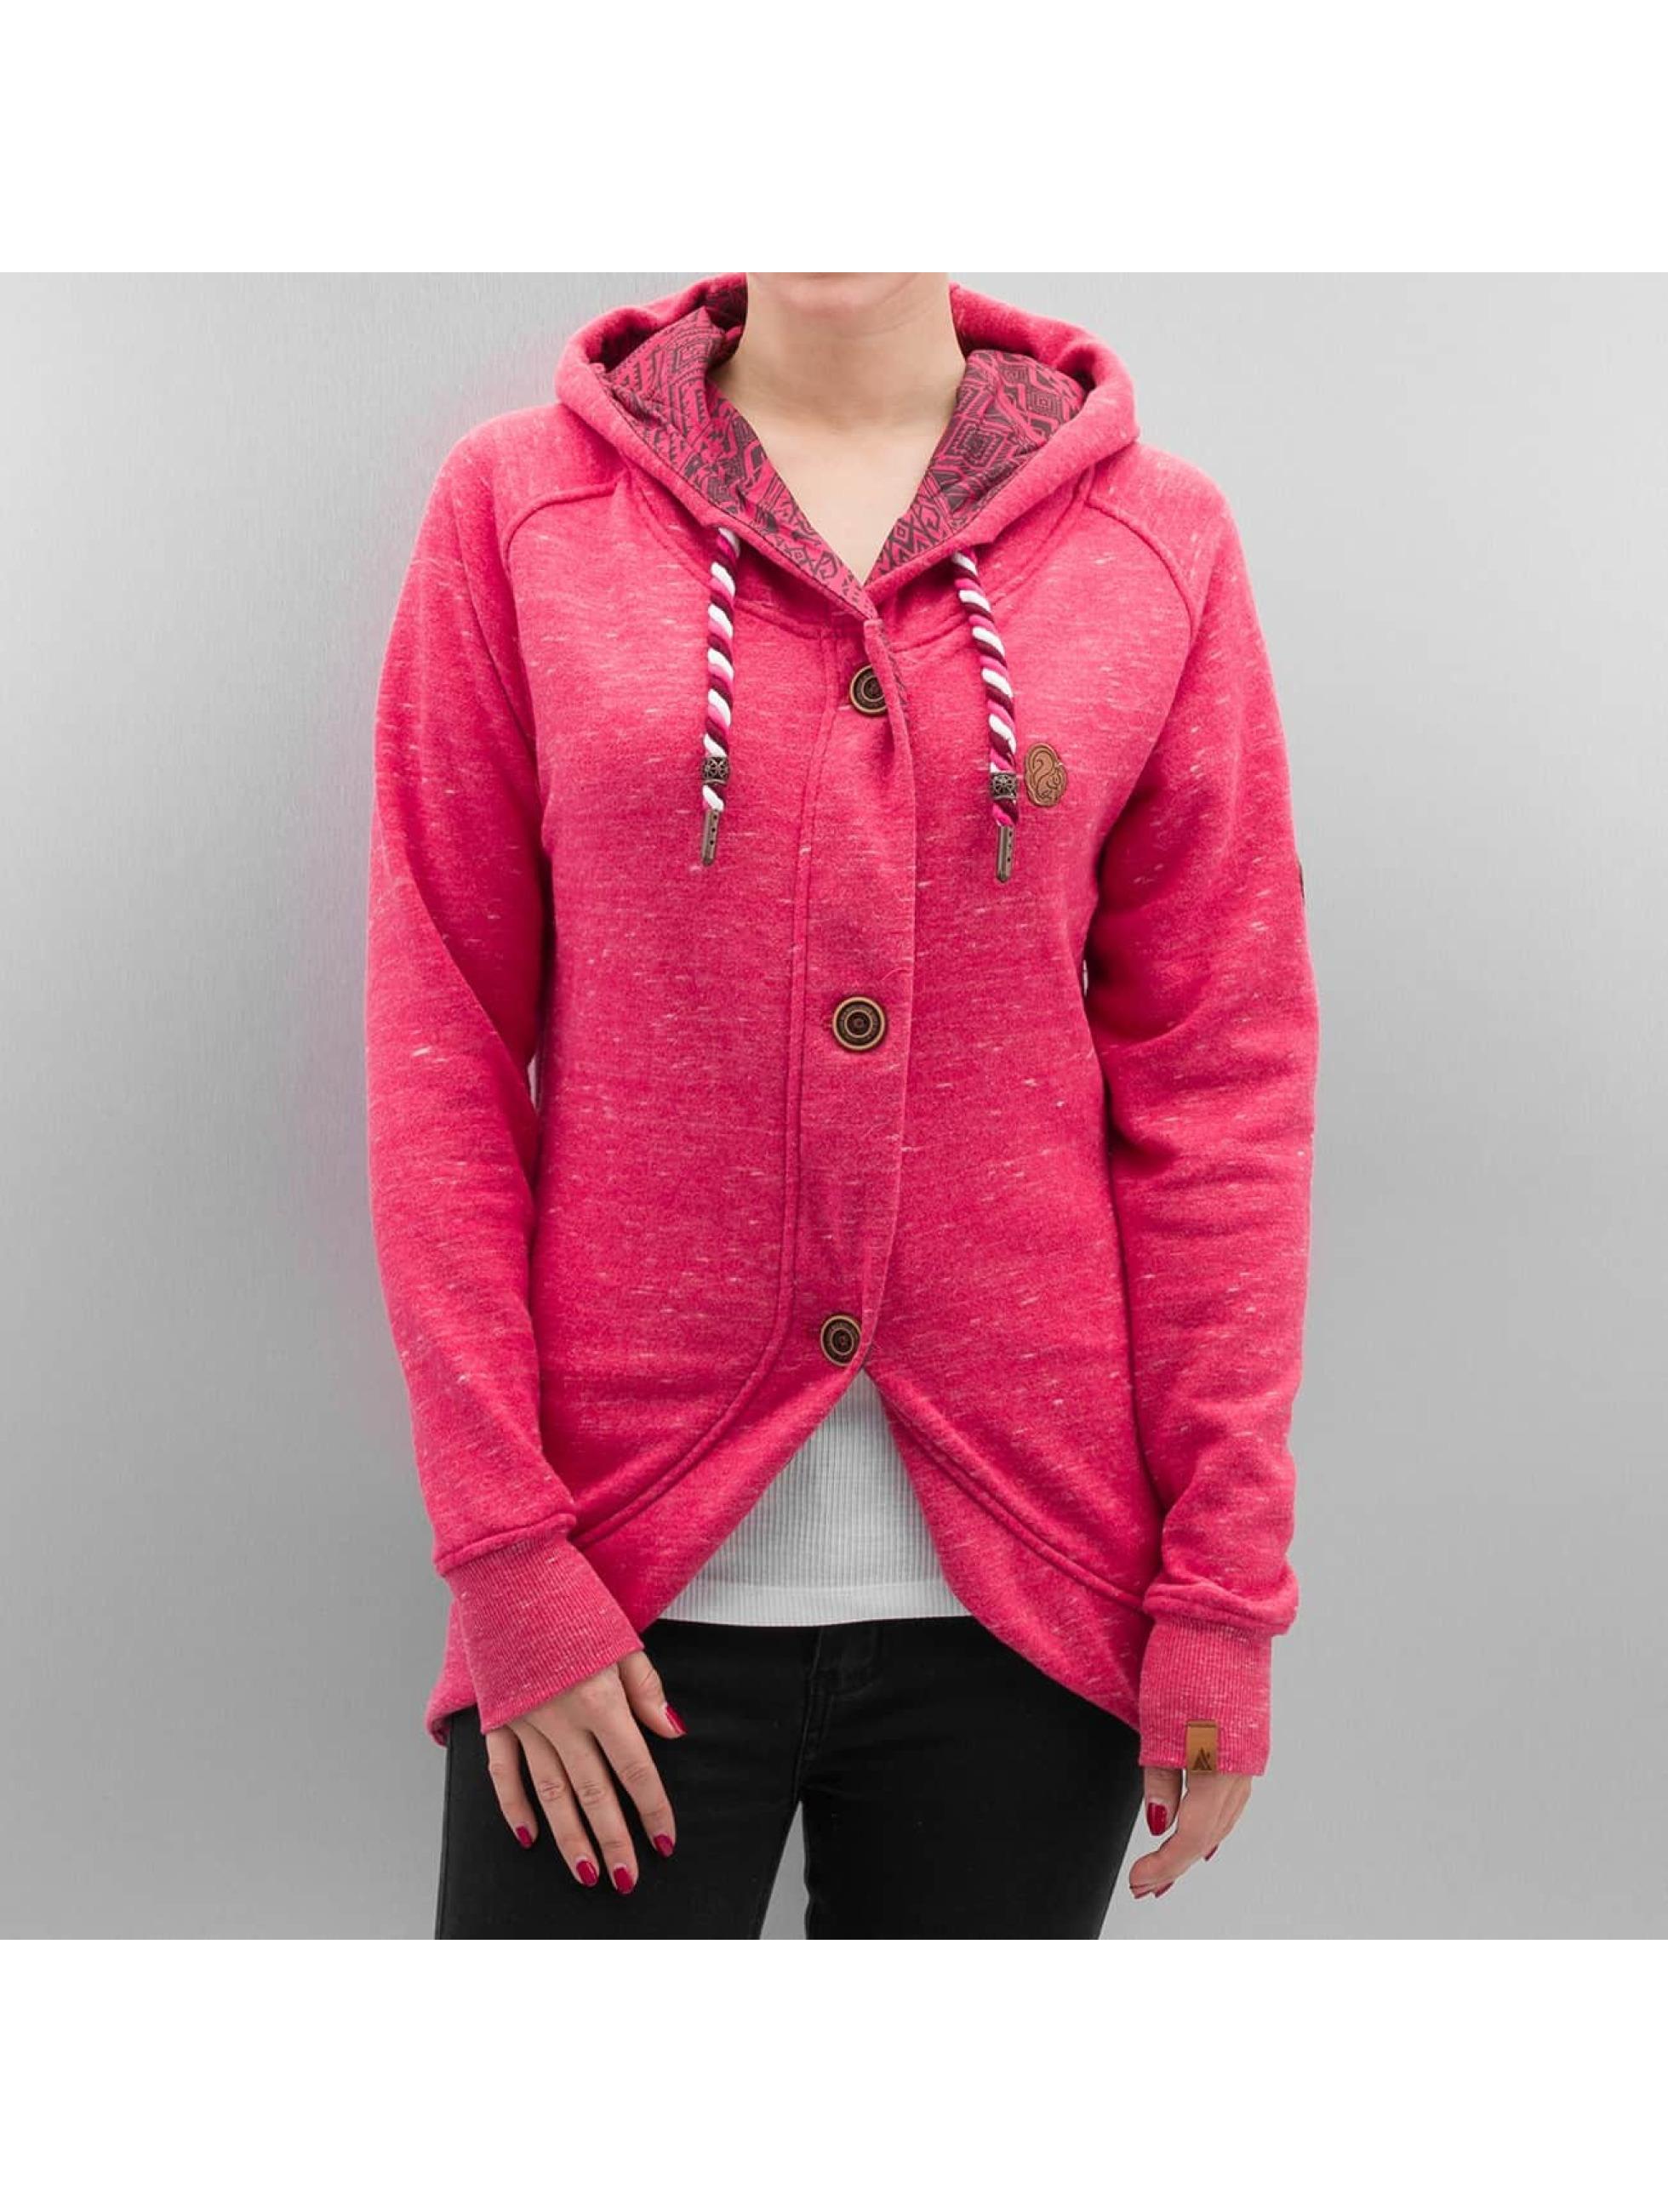 Alife & Kickin Frauen Übergangsjacke Mary in pink